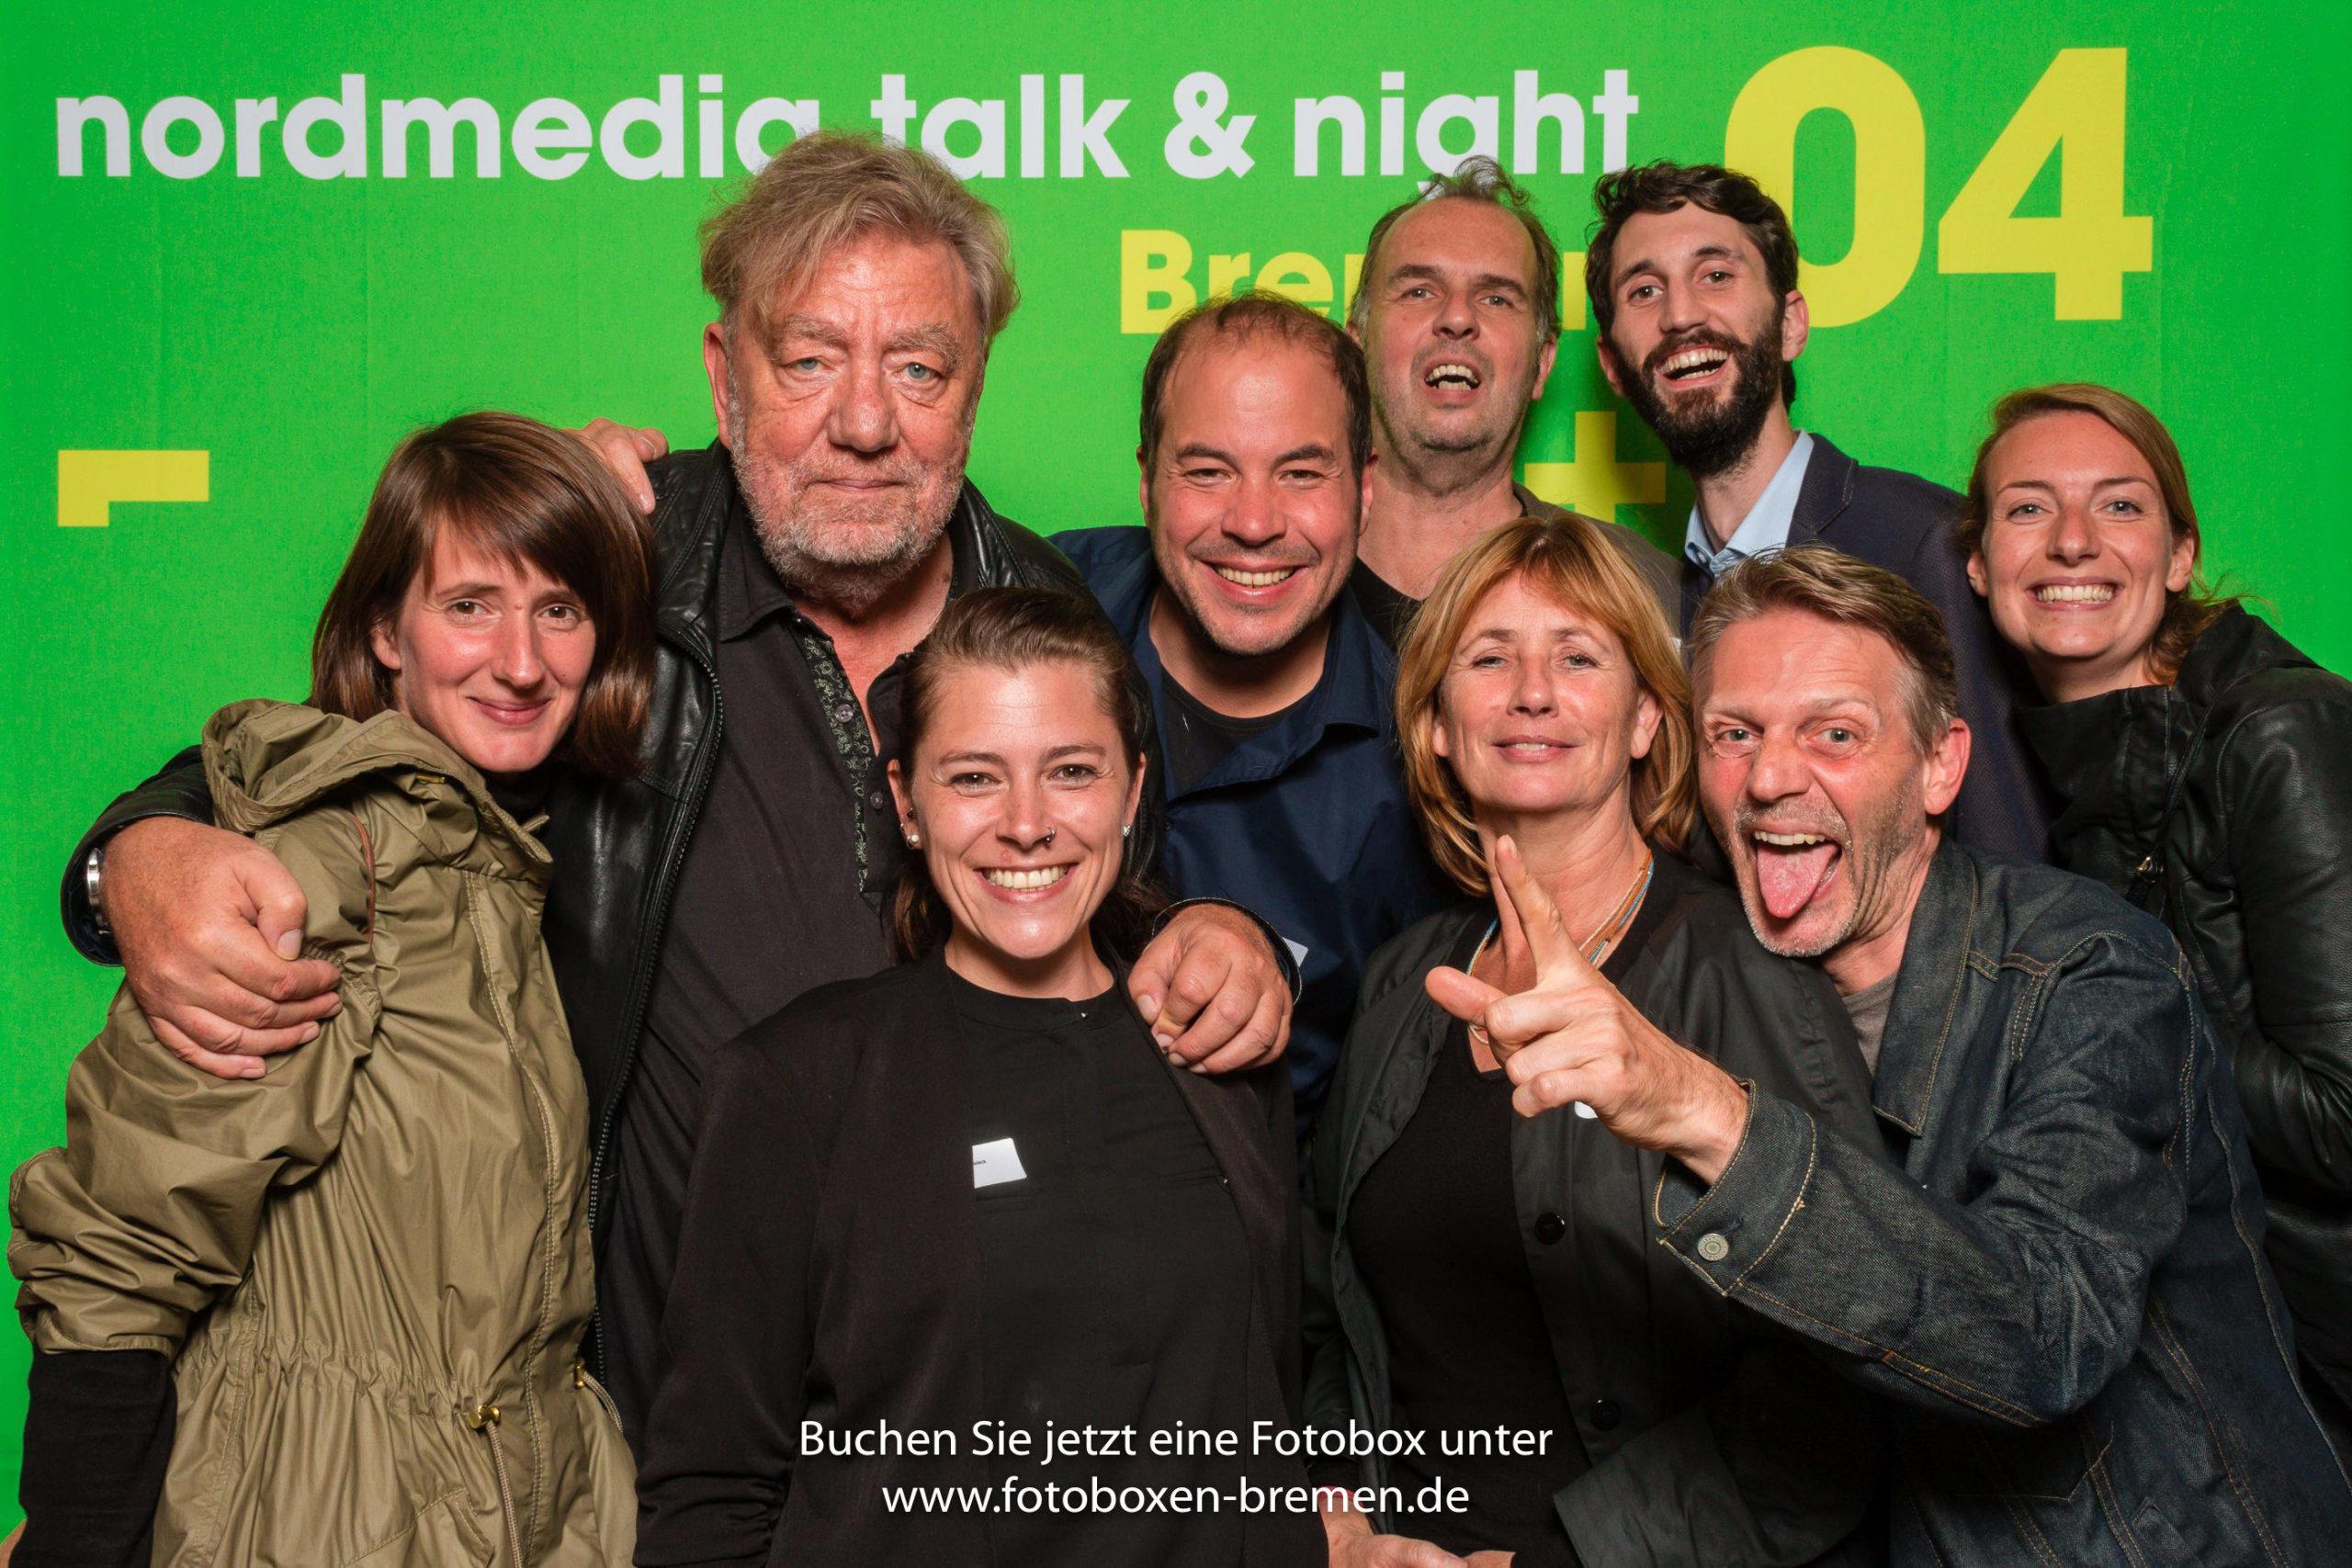 Fotobox Bremen Veranstaltung6 scaled - Fotobox Bremen mieten